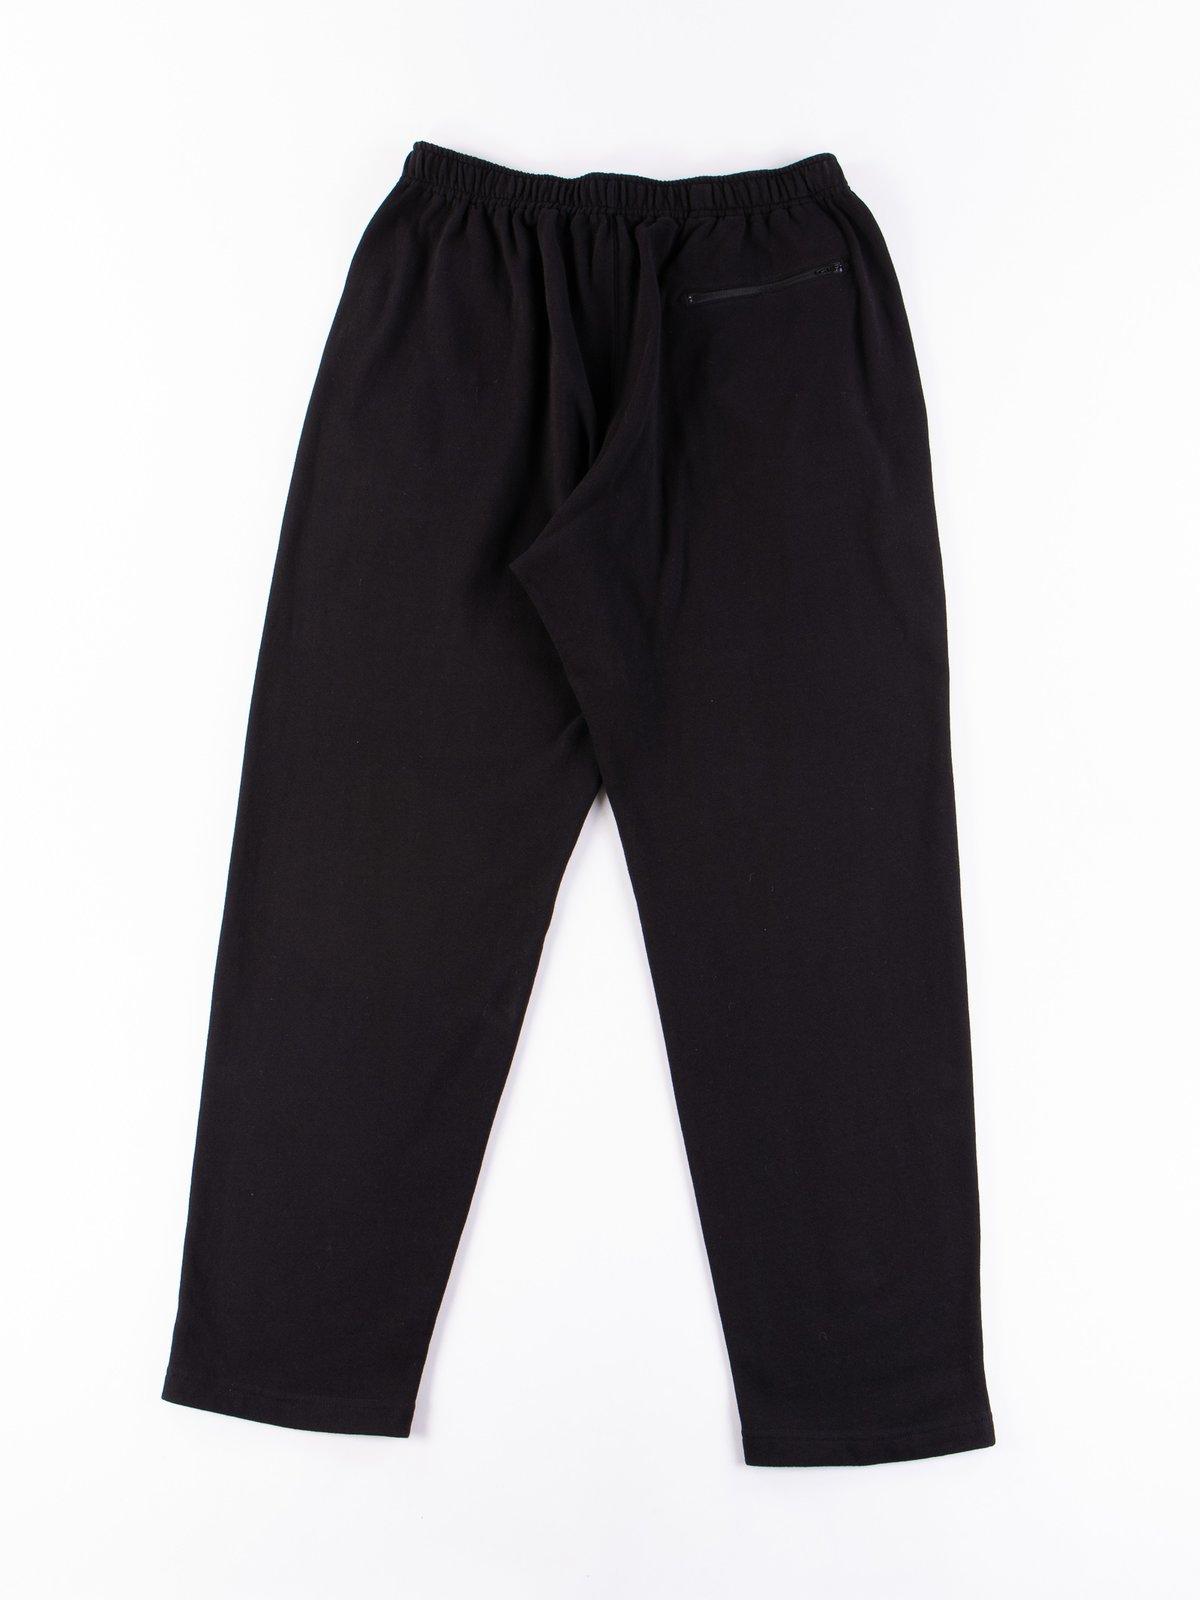 Black Jog Pant - Image 5